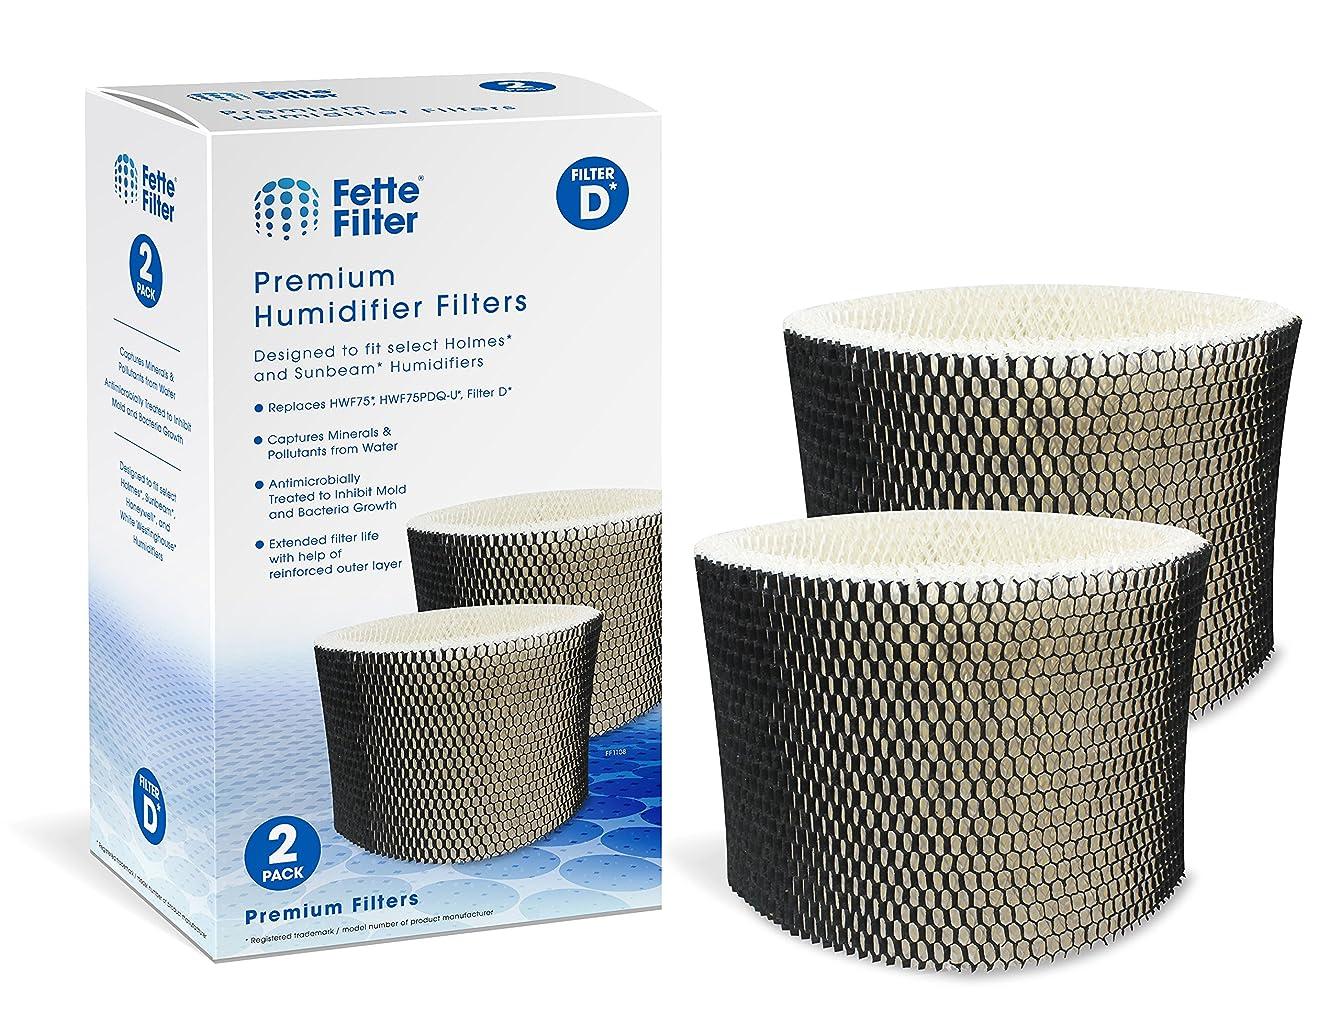 Fette Filter - Humidifier Filter Compatible with Holmes HWF75, HWF75CS, HWF75PDQ-U - Filter D (2-Pack)